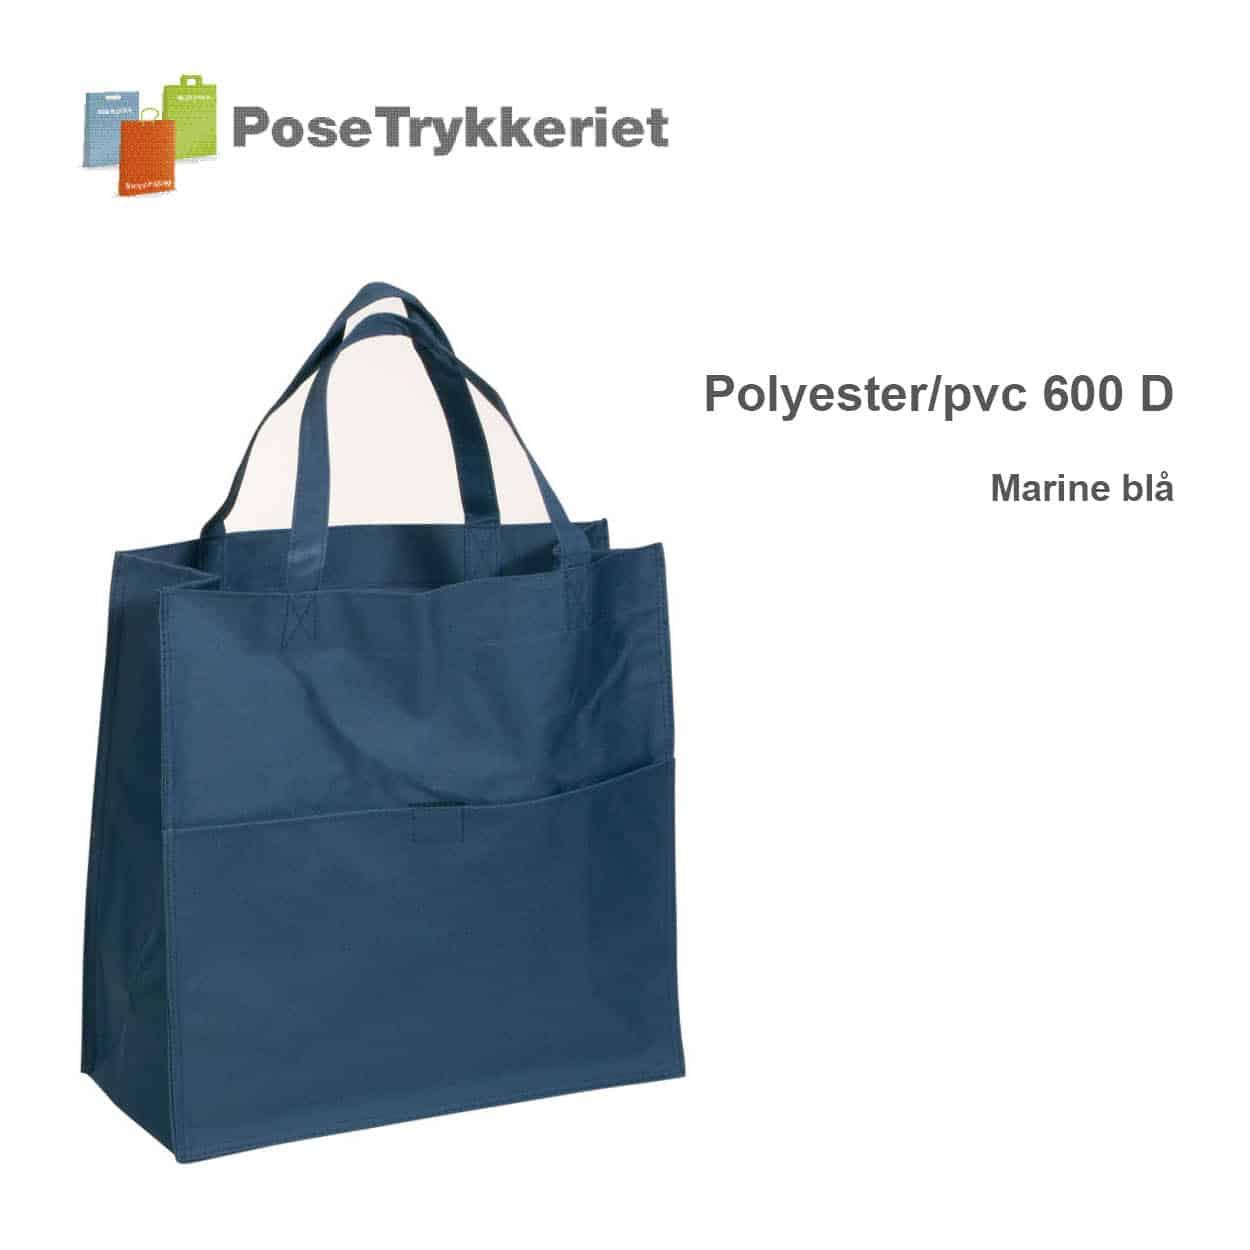 Revisor poser polyester 600 D. Marineblå. PoseTrykkeriet.dk